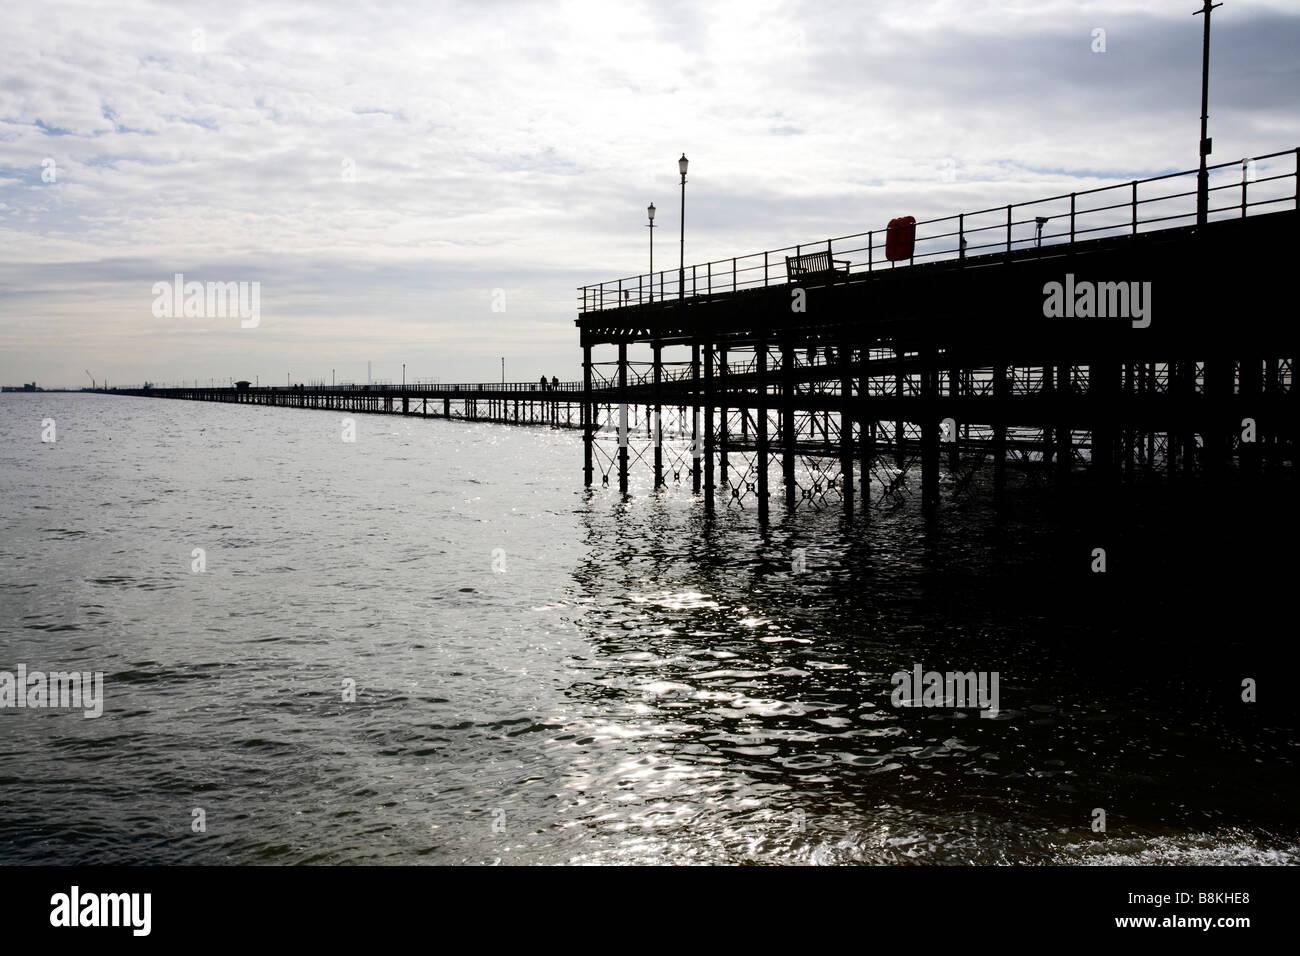 Southend Pier - Stock Image